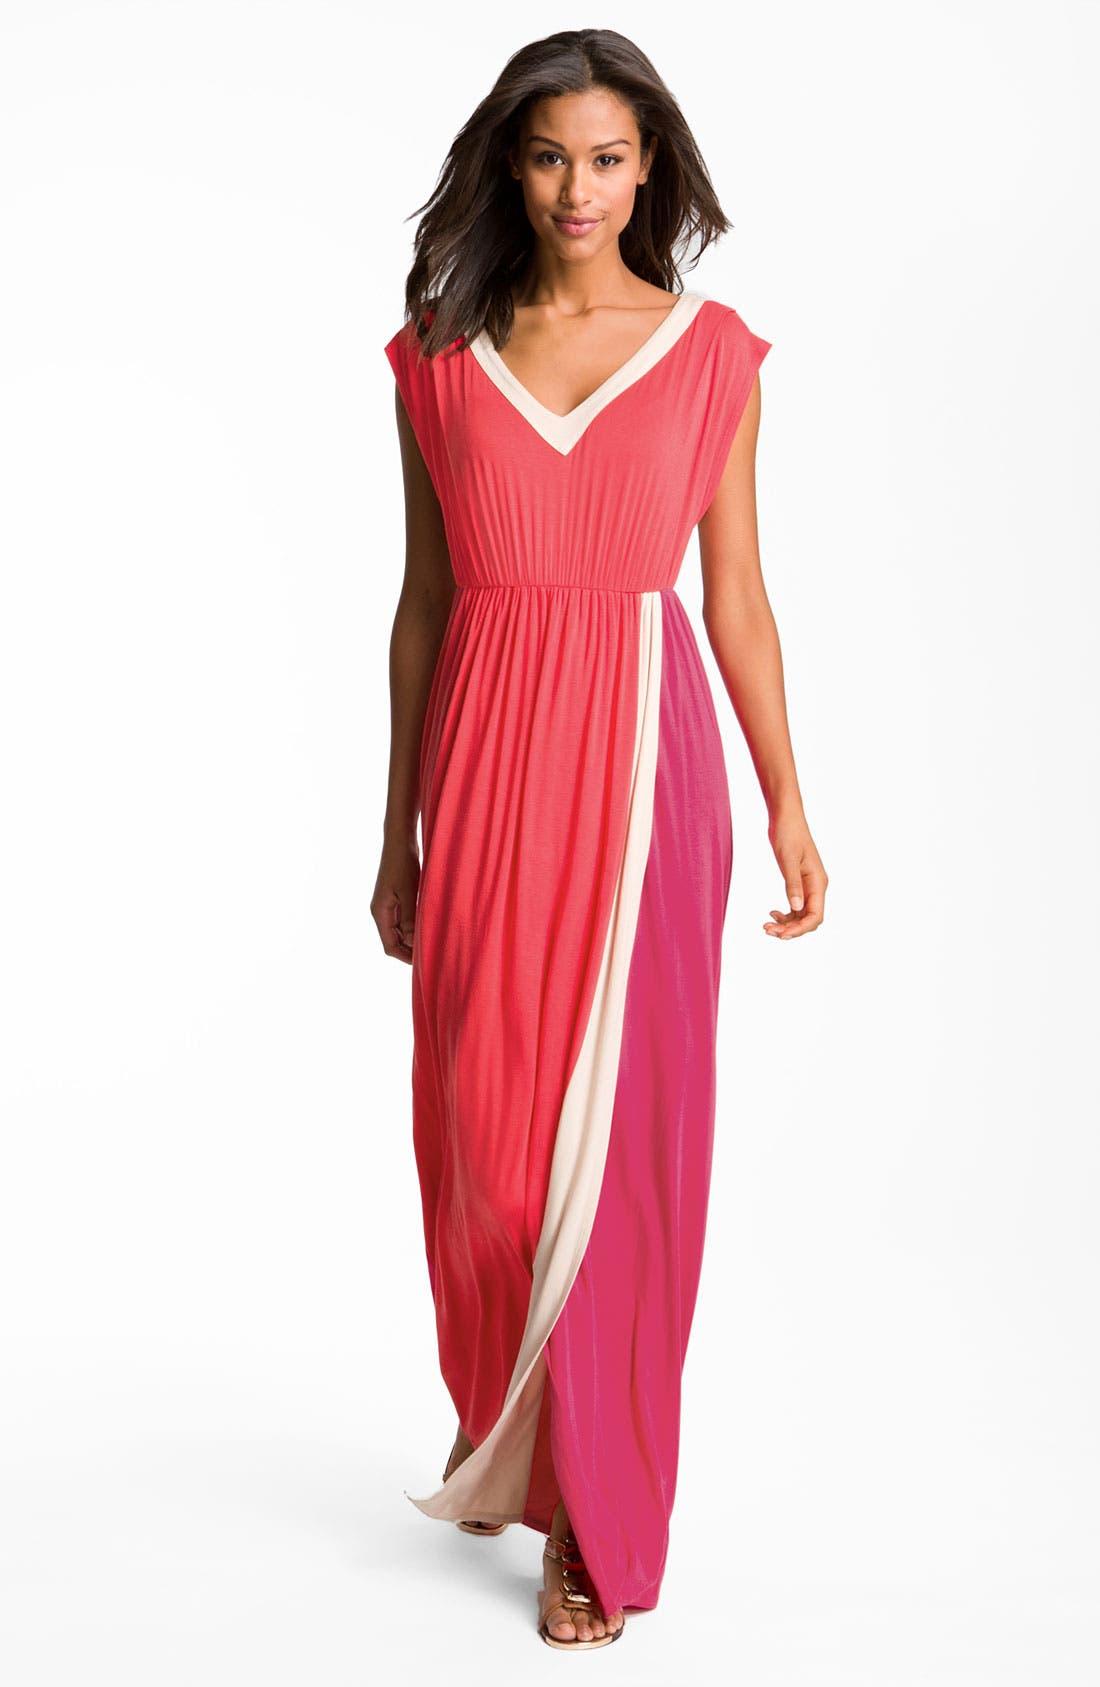 Main Image - Felicity & Coco Contrast Trim Colorblock Jersey Maxi Dress (Nordstrom Exclusive)